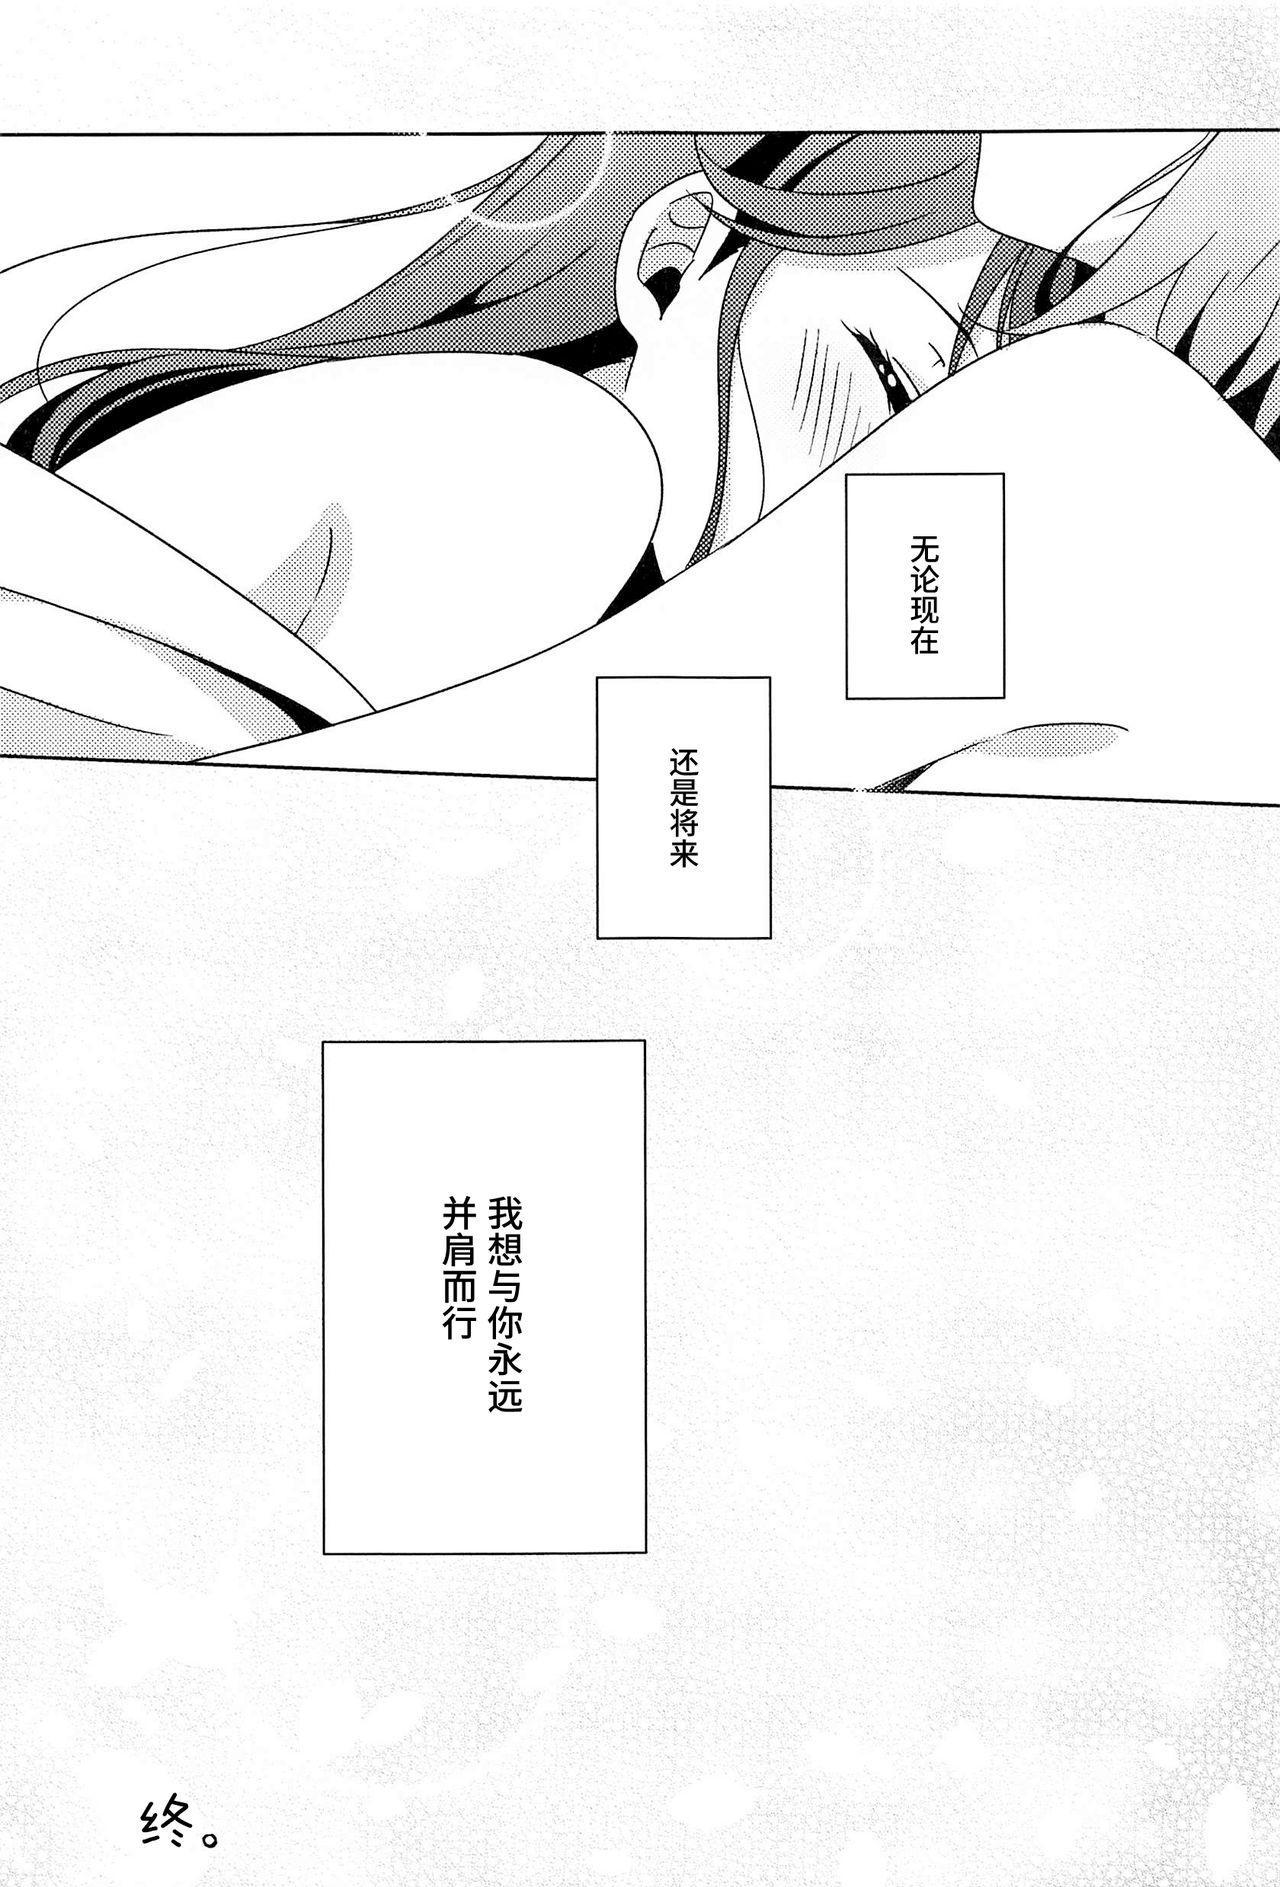 Chika-chan no ○○ ga Hairanai | 千歌的丁丁放不进来 32